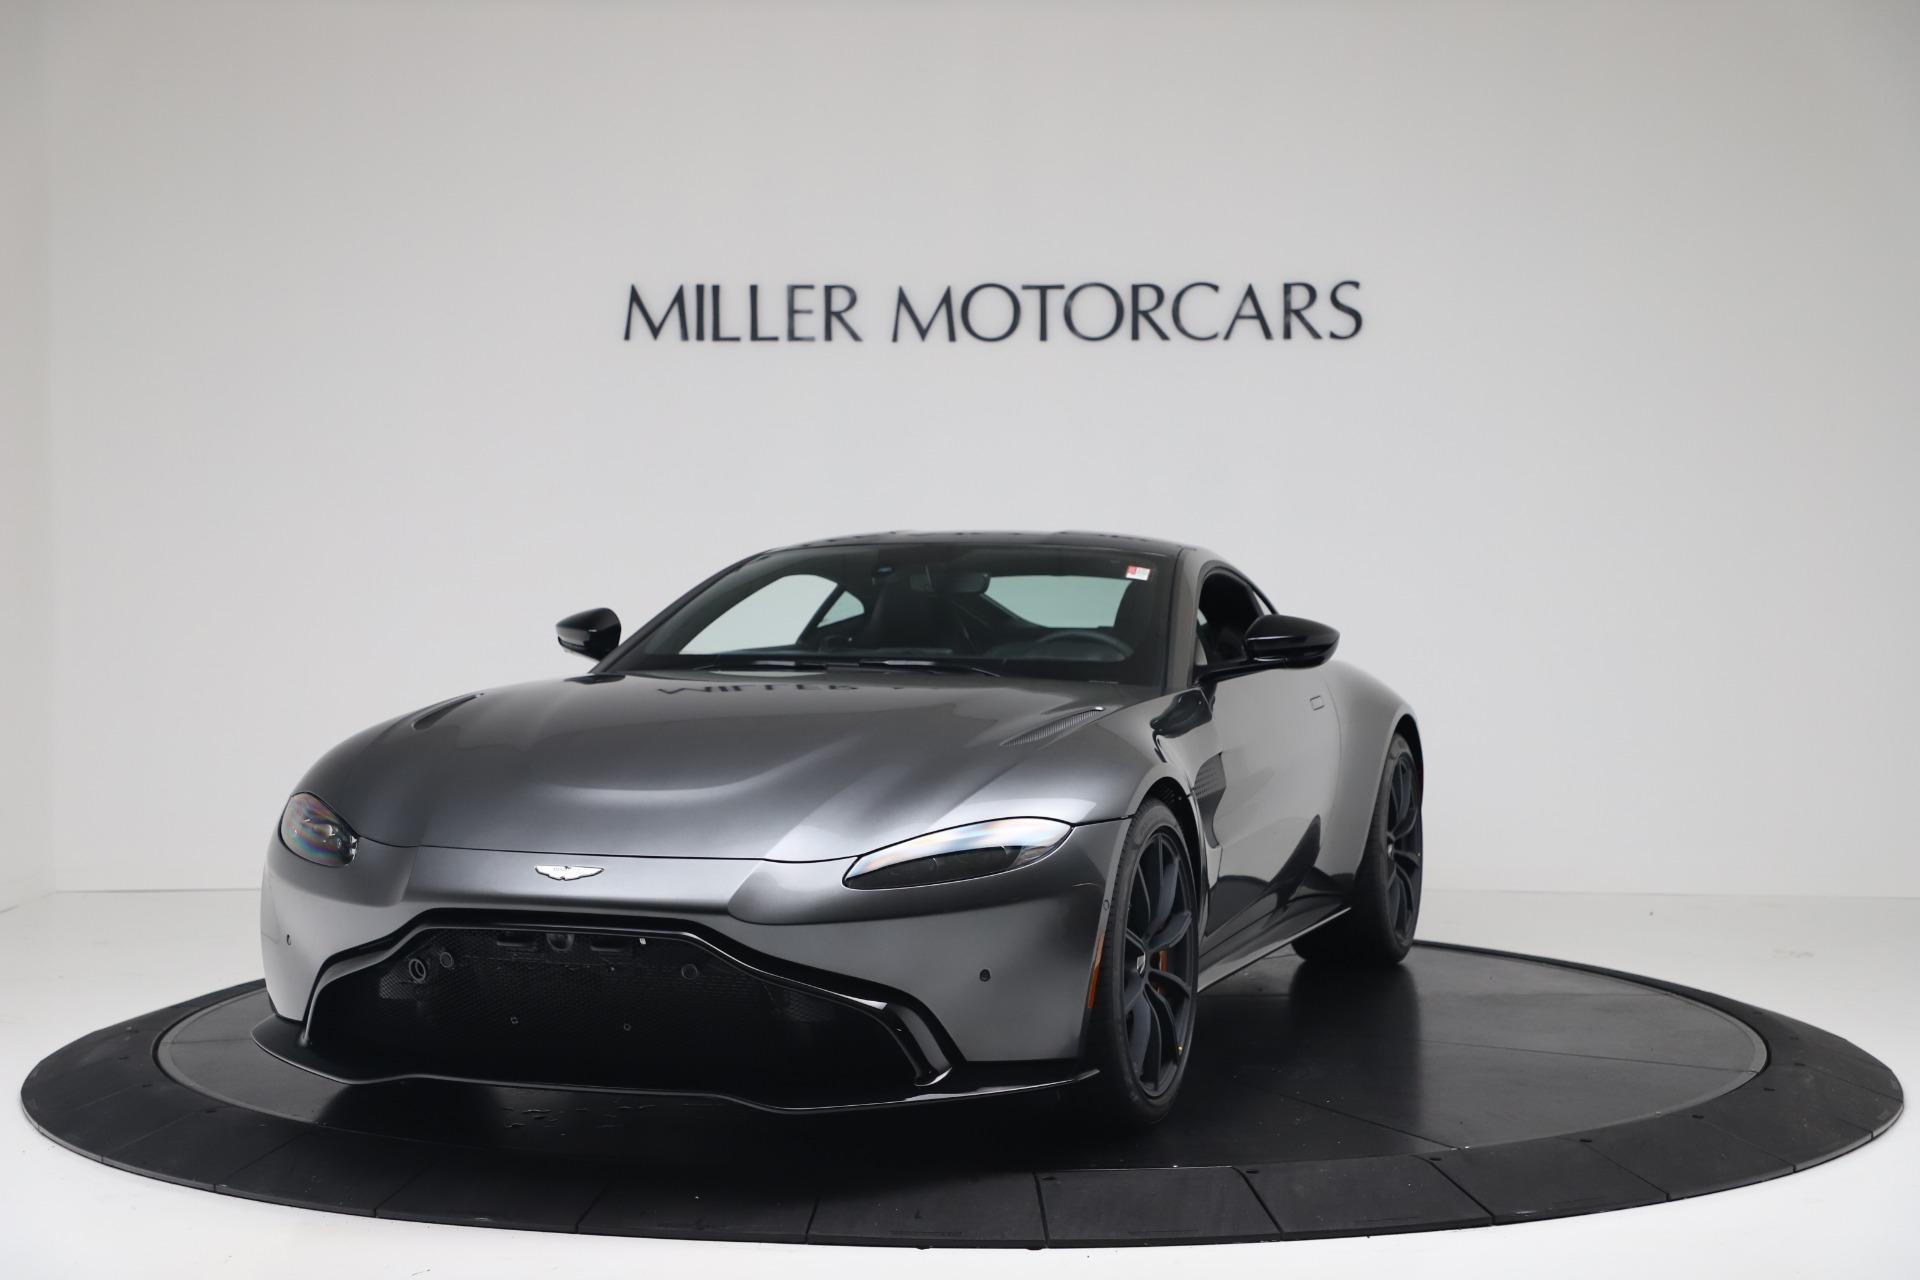 New 2020 Aston Martin Vantage V8 For Sale In Greenwich, CT 3408_p3